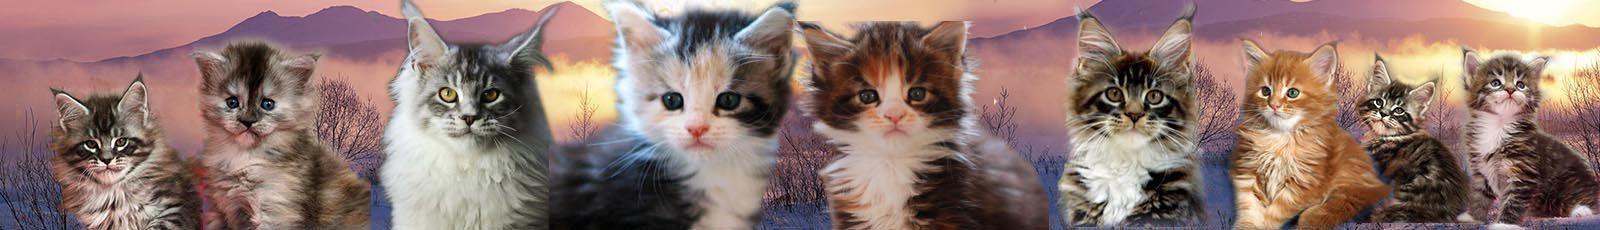 chatons maine coon roux, roux et blanc, tortie silver, tortie et blanc